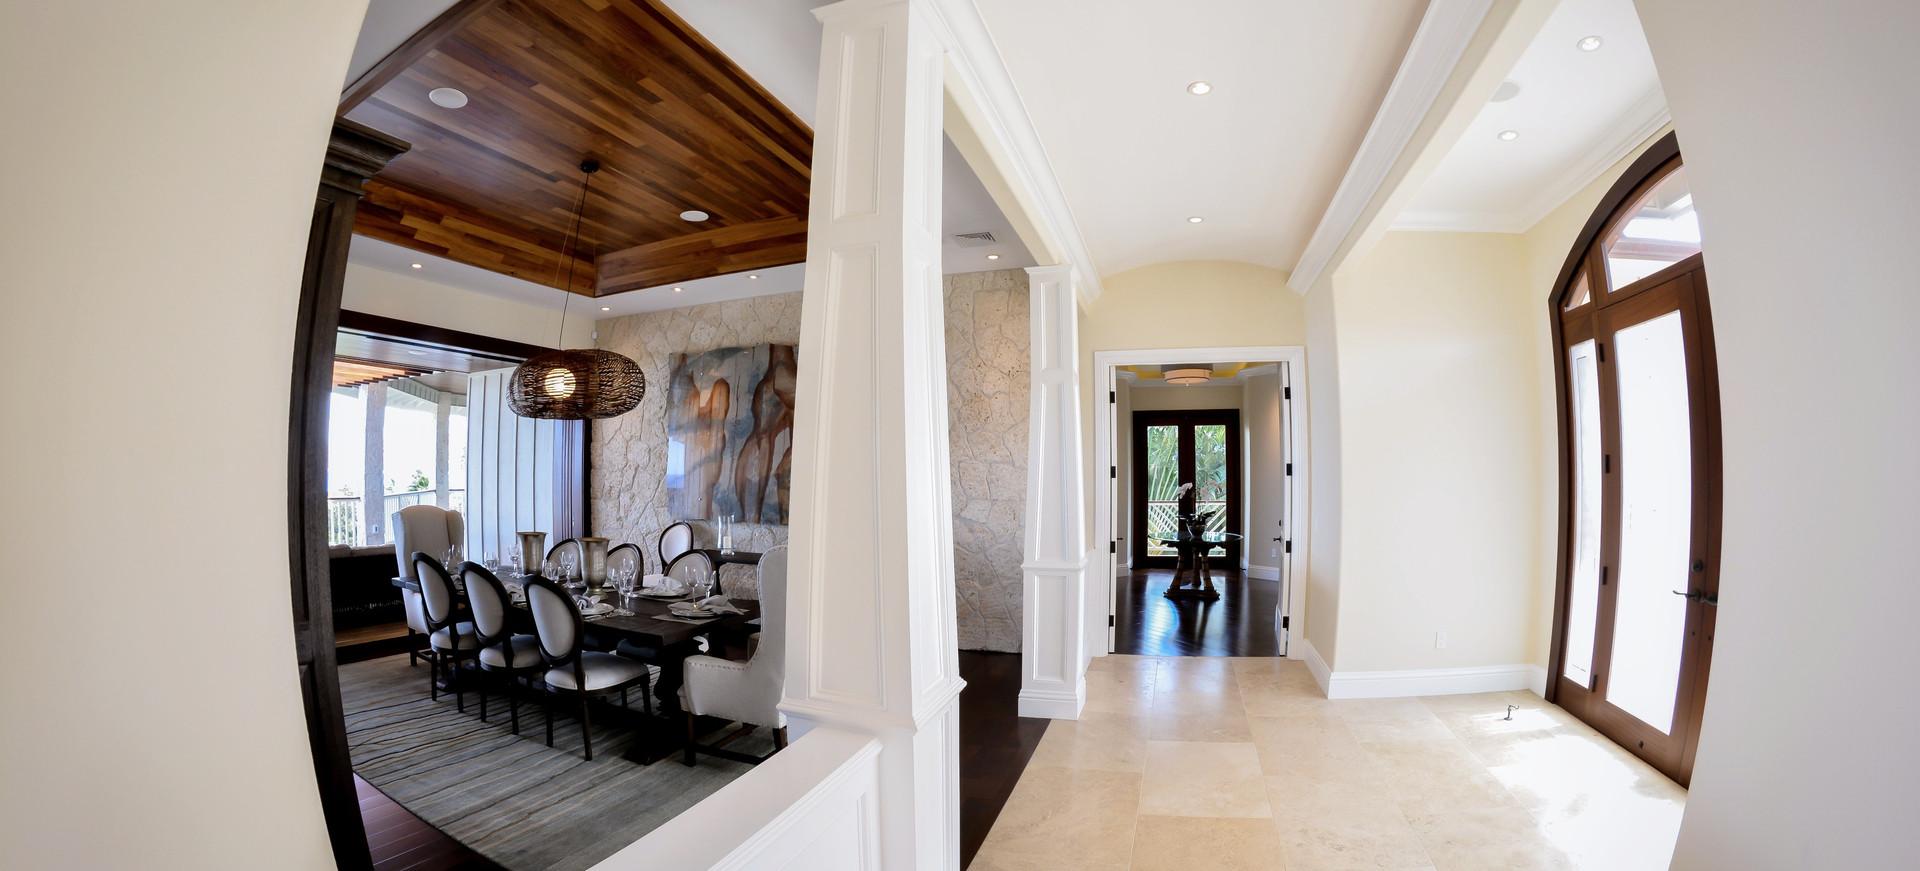 Hallway of Continental Hale